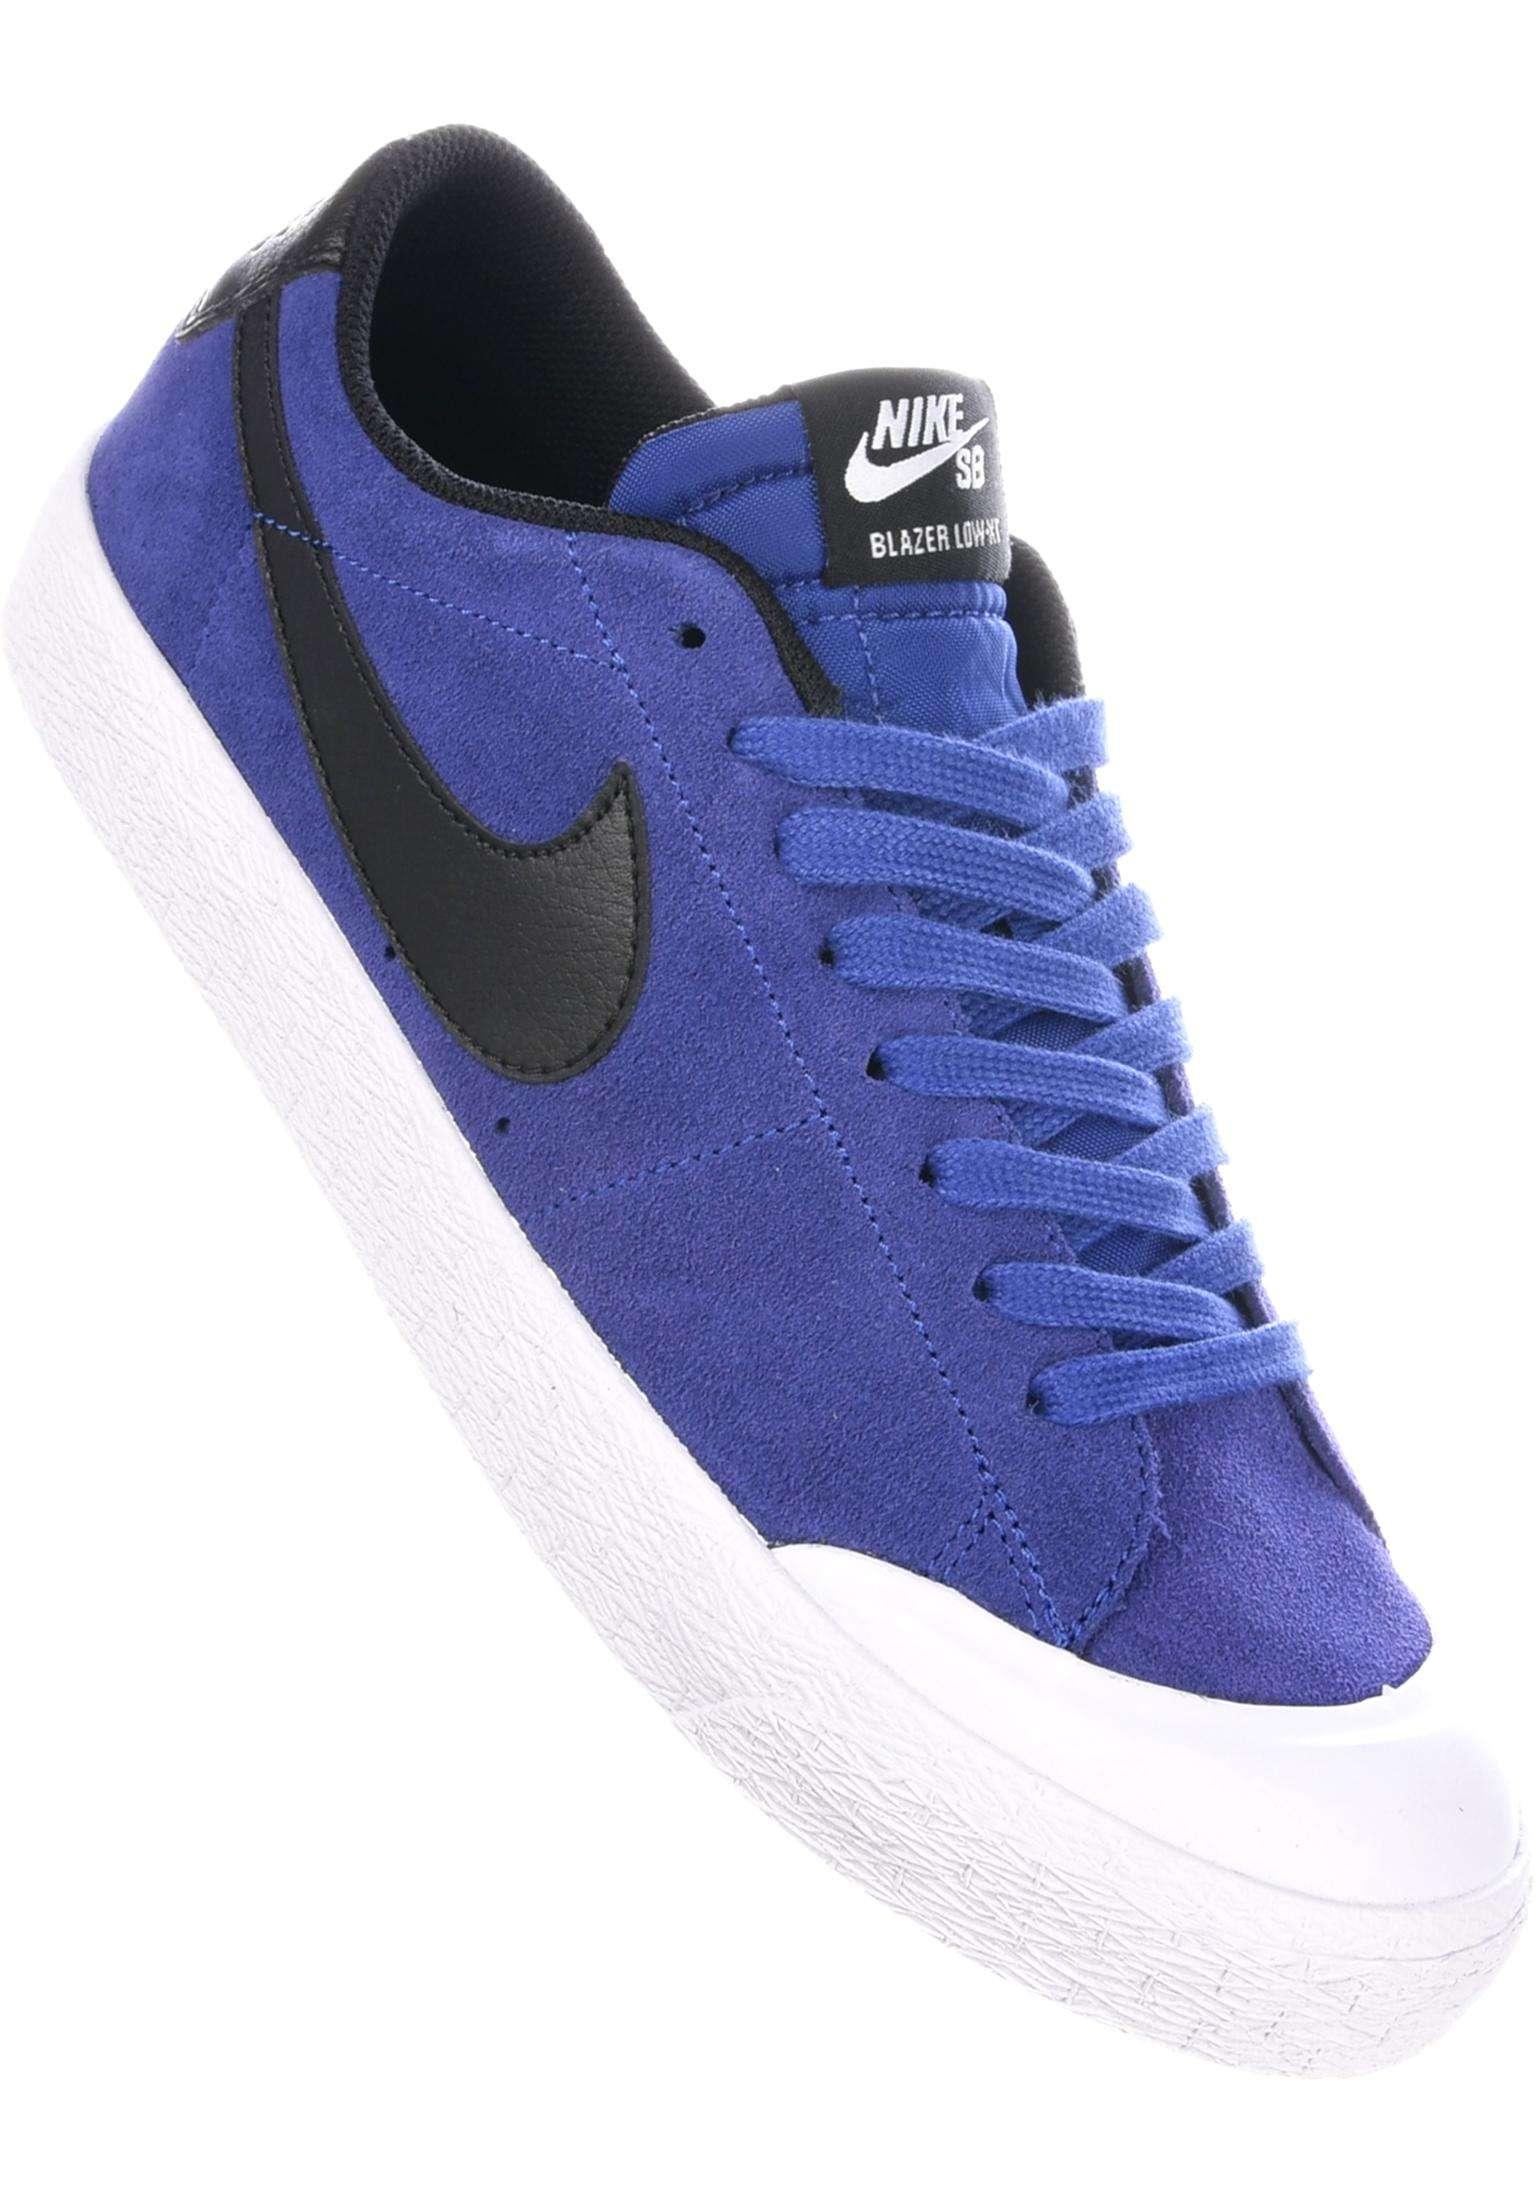 separation shoes 91de5 b7e5d Zoom Blazer Low XT Nike SB Todo el Calzado in deepnight-black-white für  Hombre   Titus